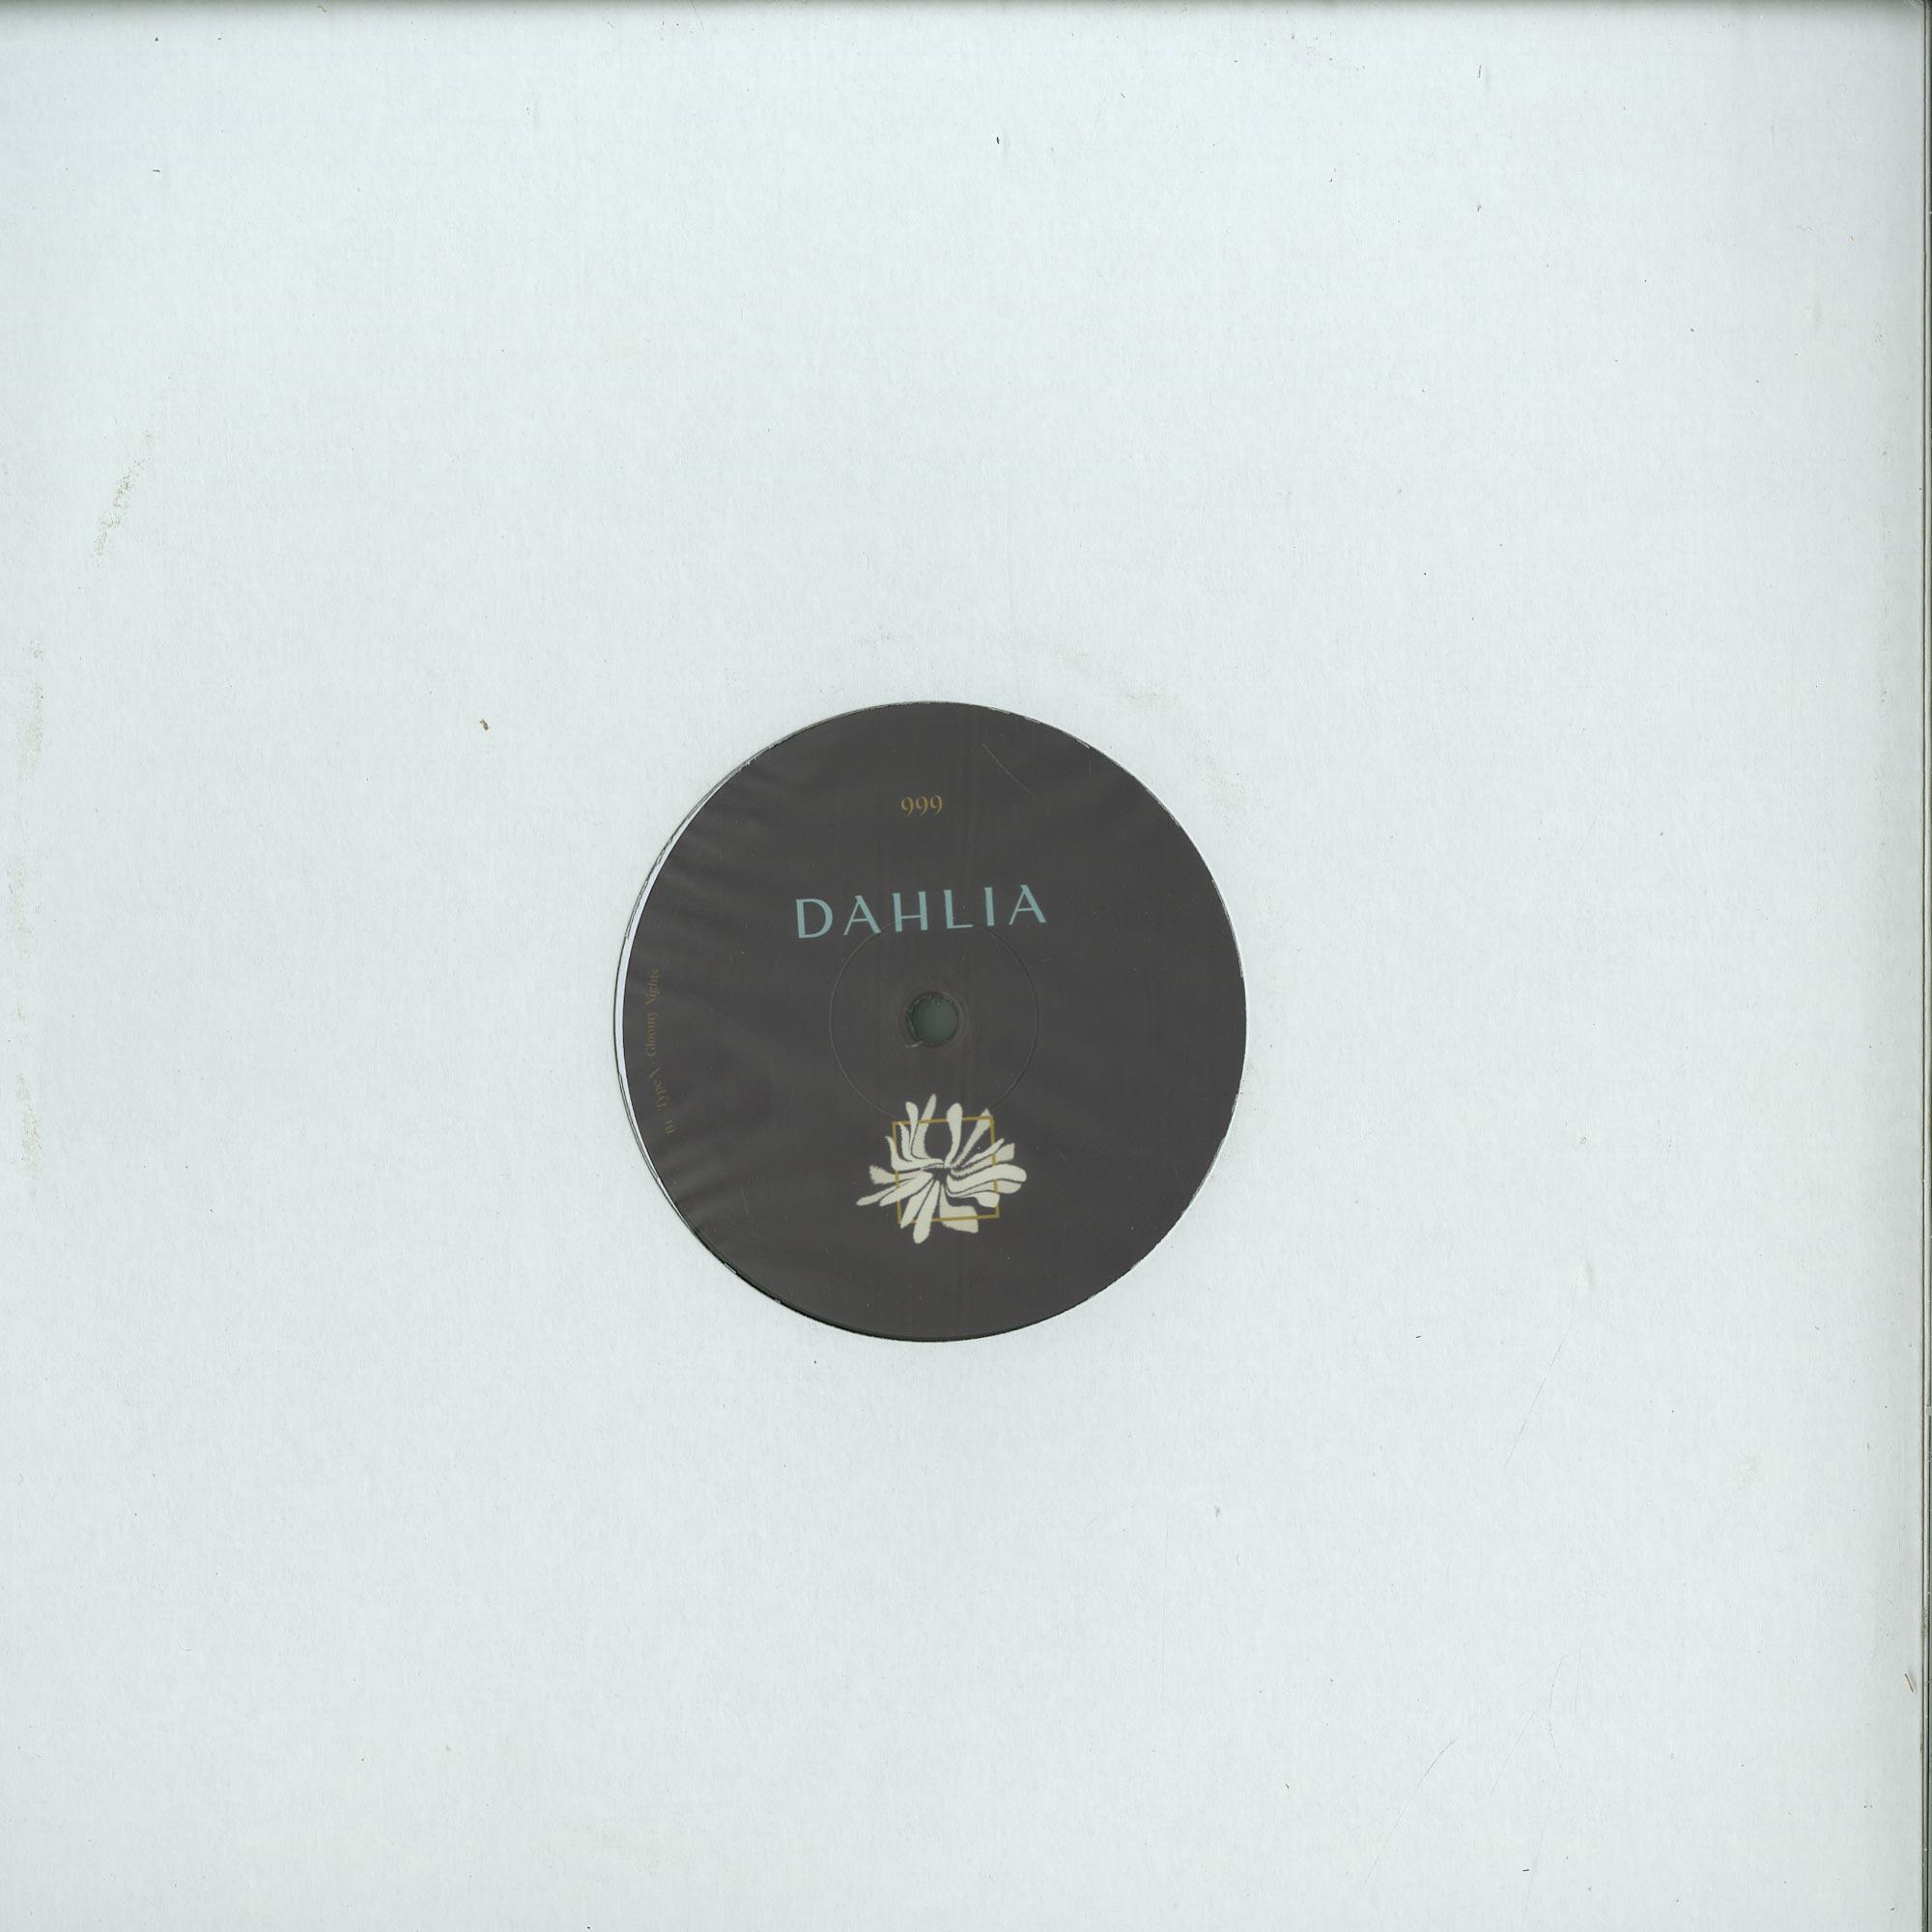 DJ Ronnie, Solah & Type X - DAHLIA999